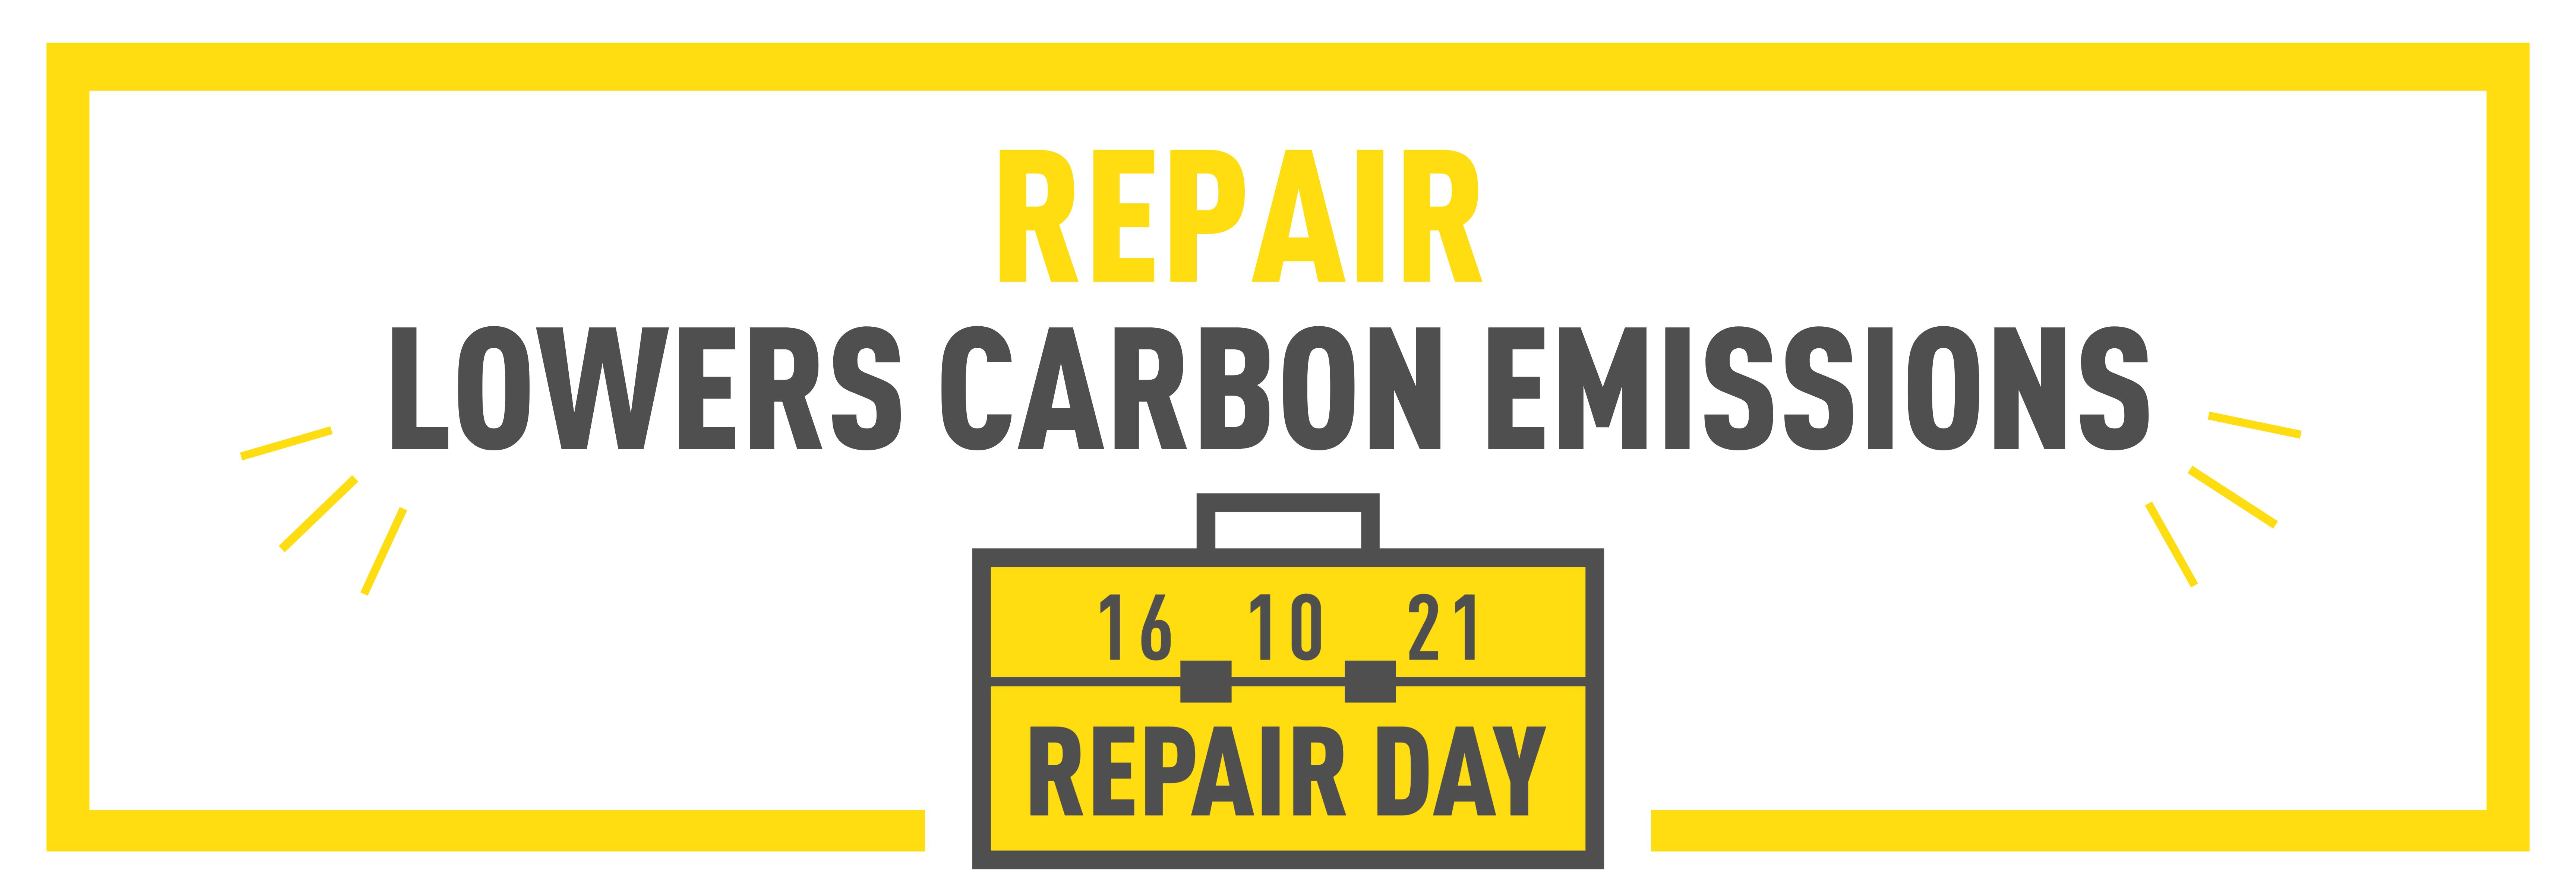 Repair Lowers Carbon Emissions: exploring the impact of consumption emissions